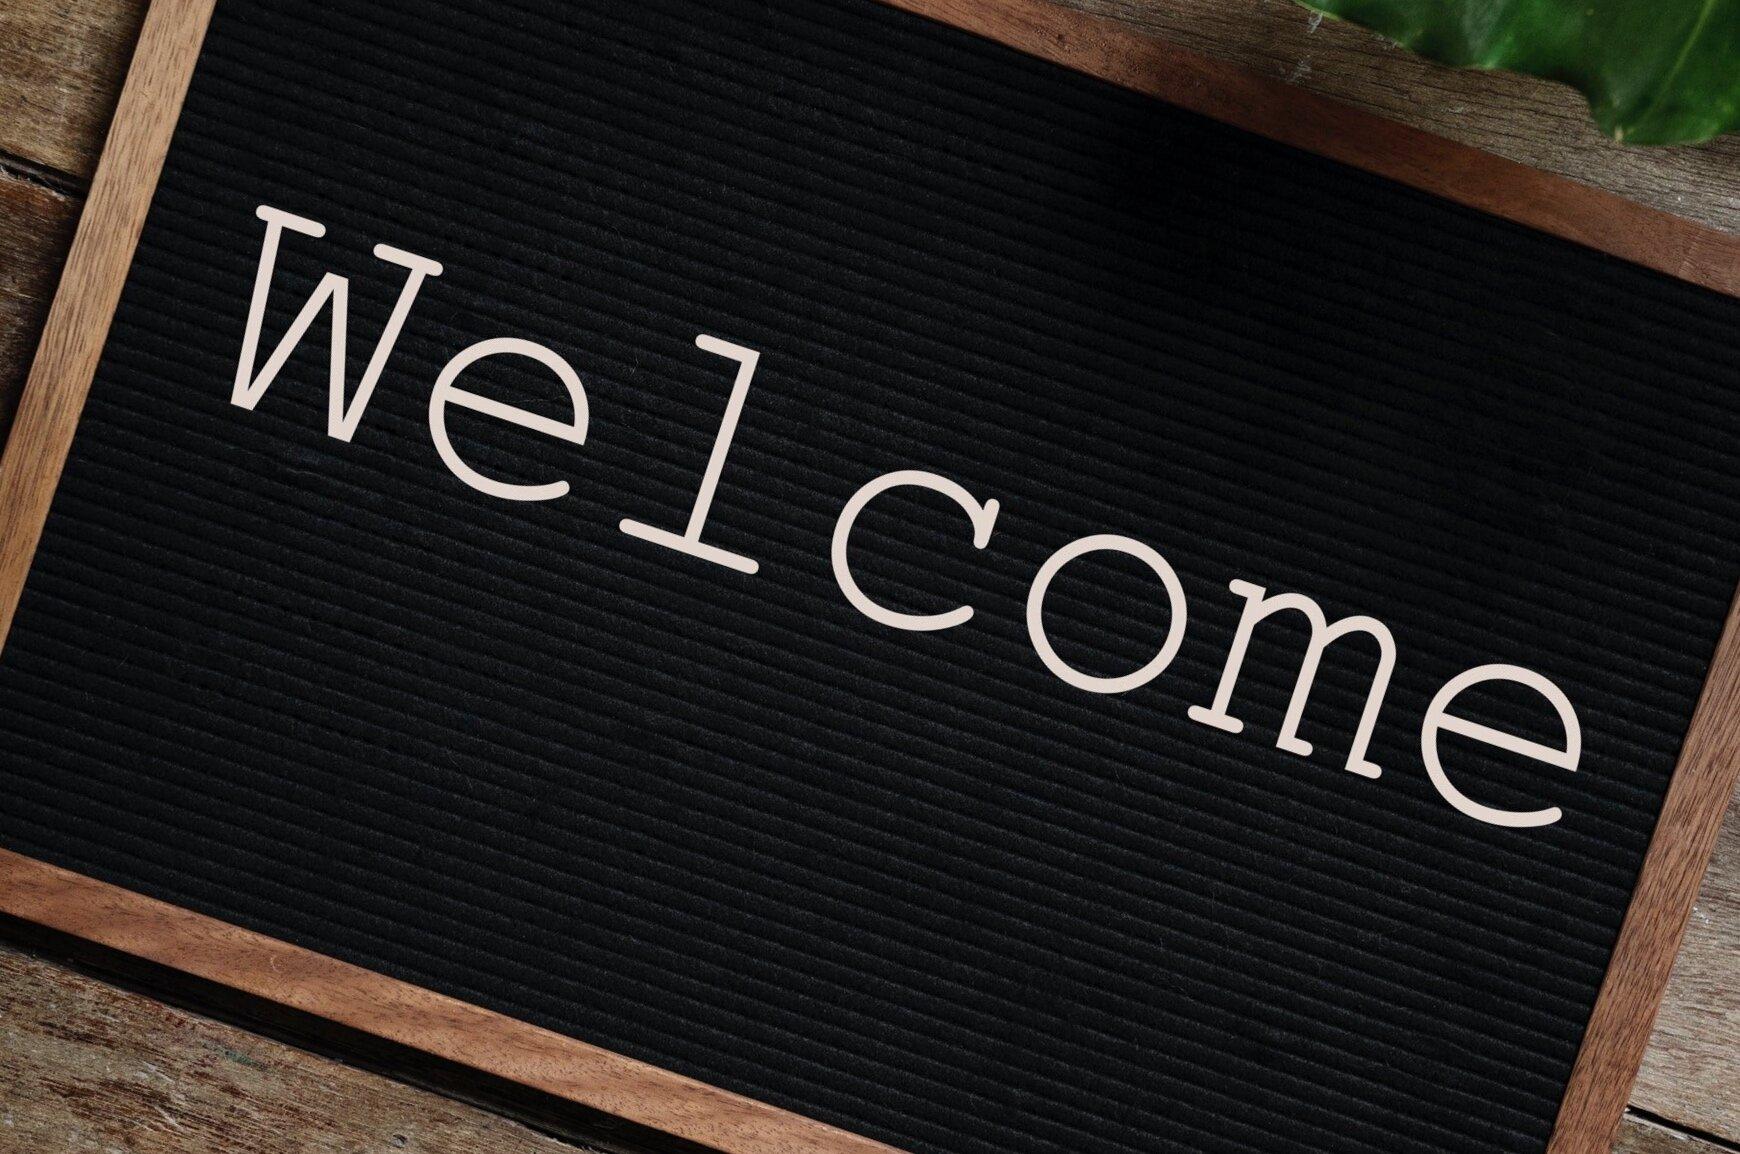 blackboard-frame-greeting-984539.jpg